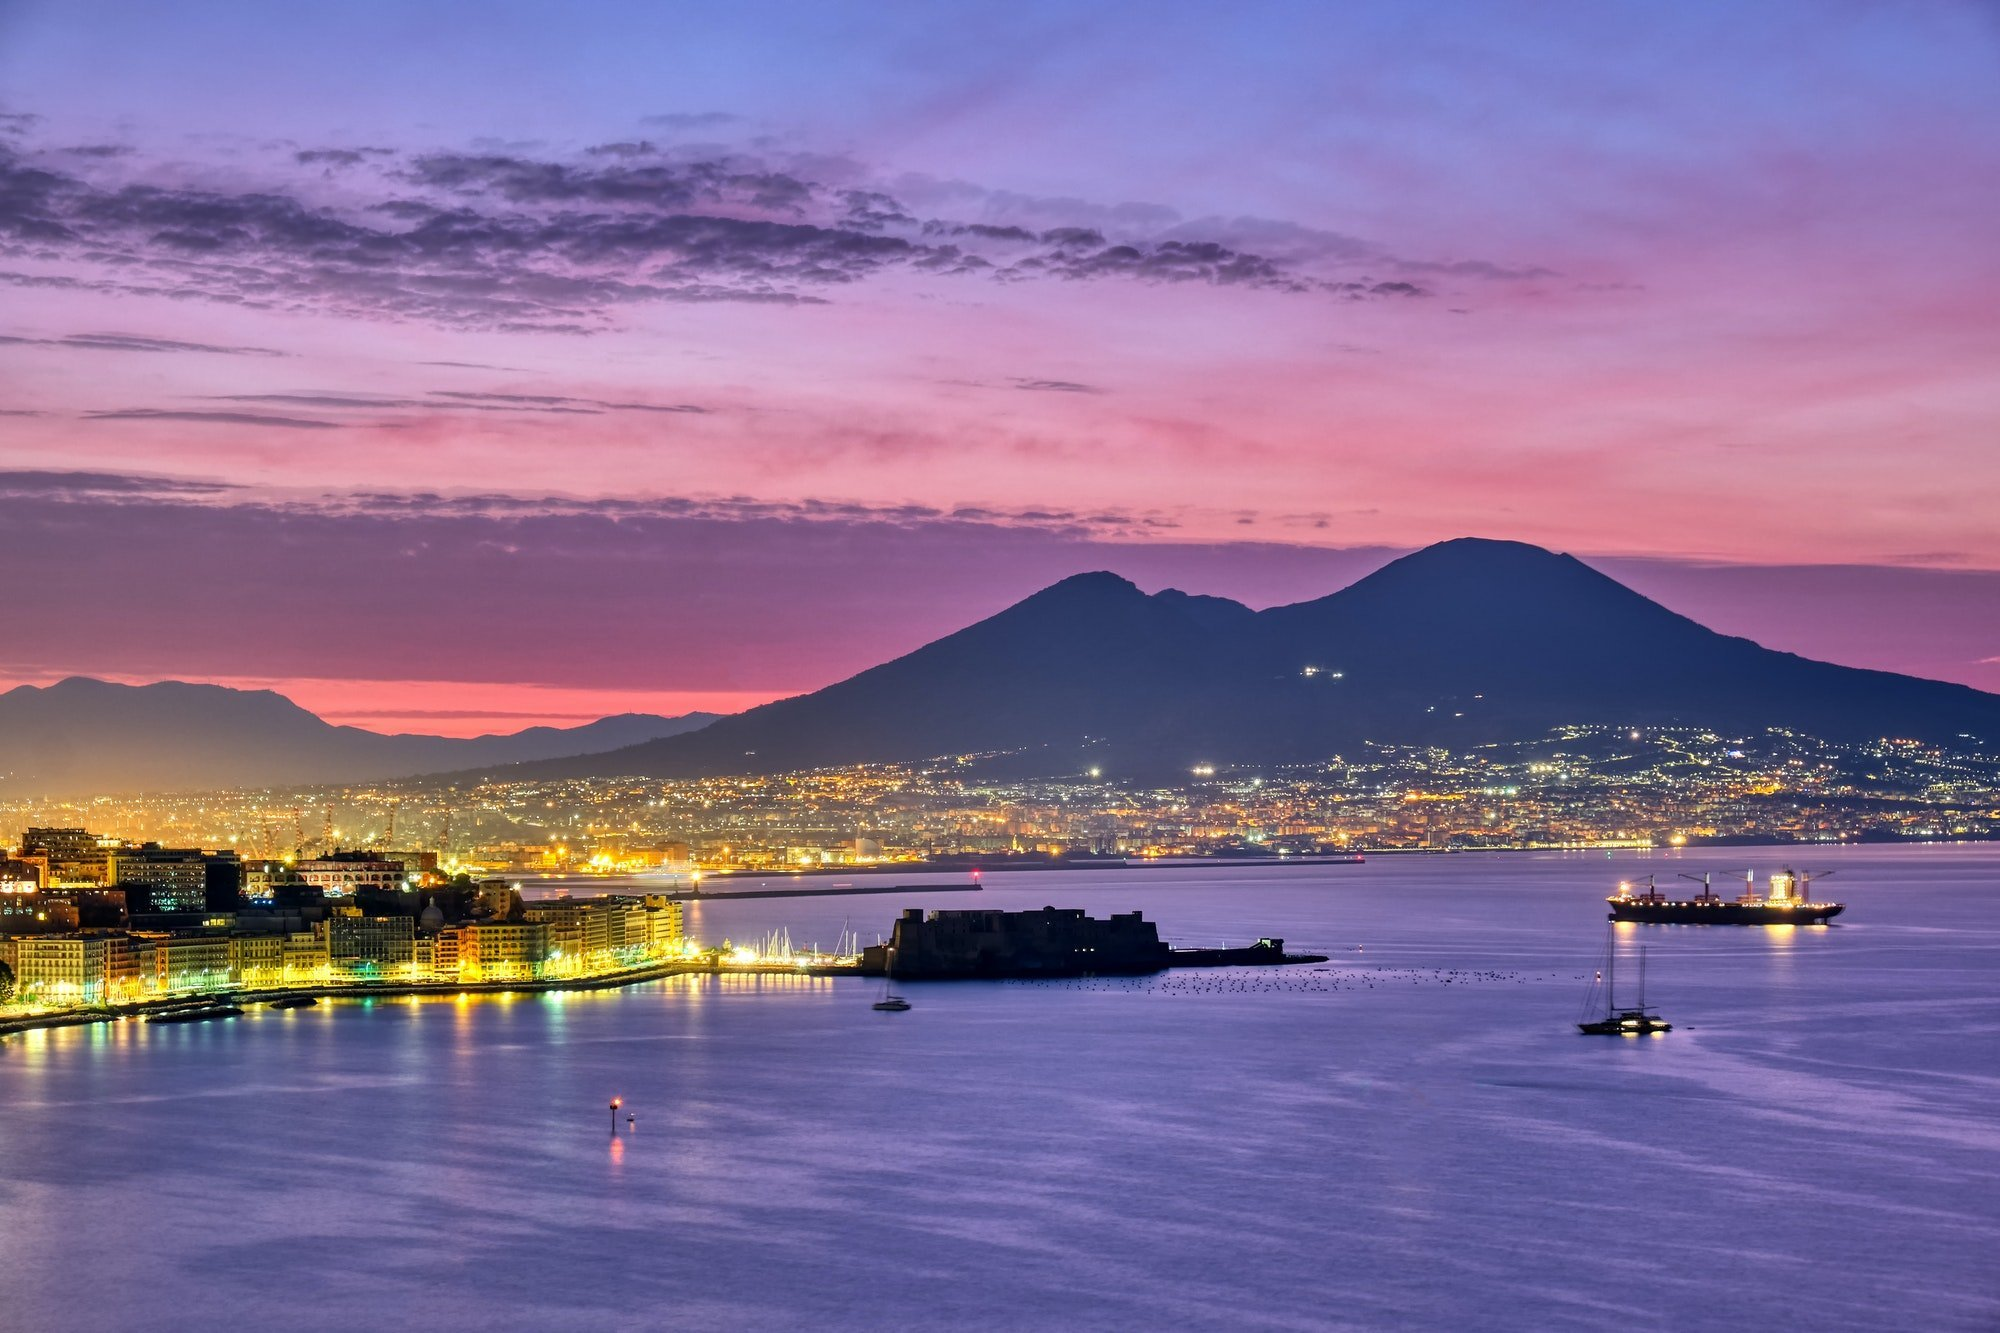 Mount Vesuvius and the gulf of Naples